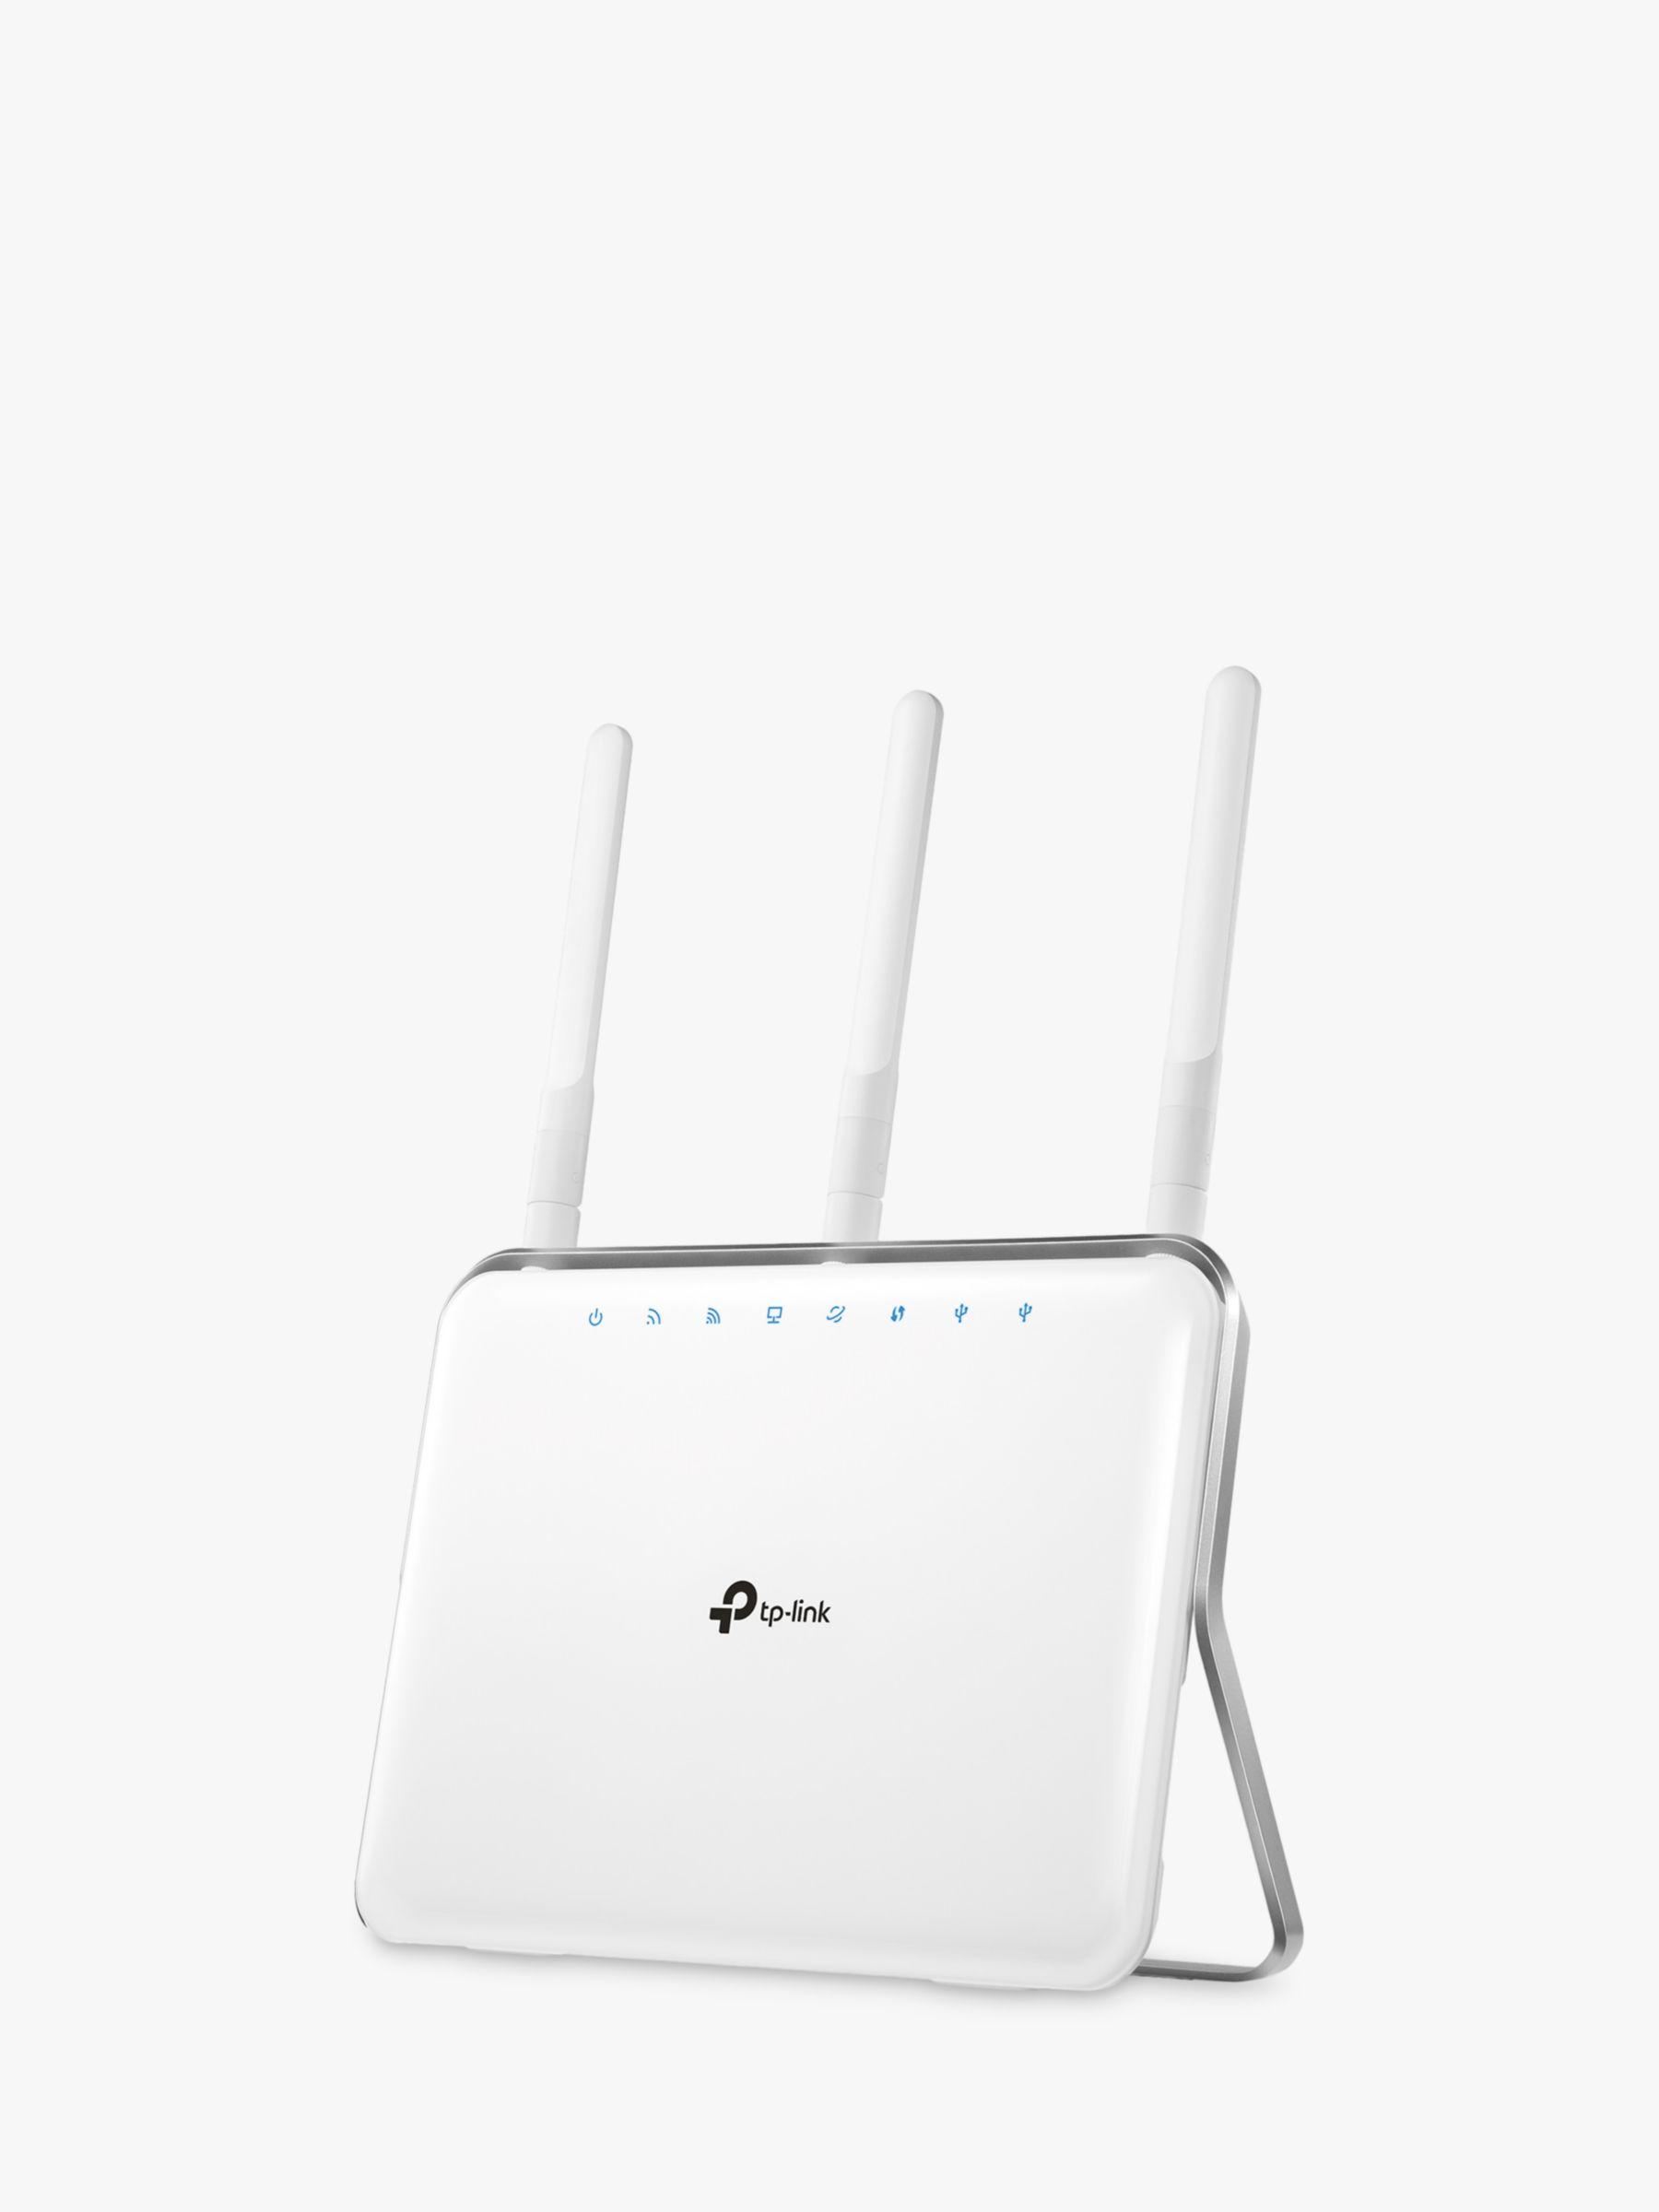 TP-Link TP-LINK AC1900 Wireless Dual Band Gigabit Router, Archer 9